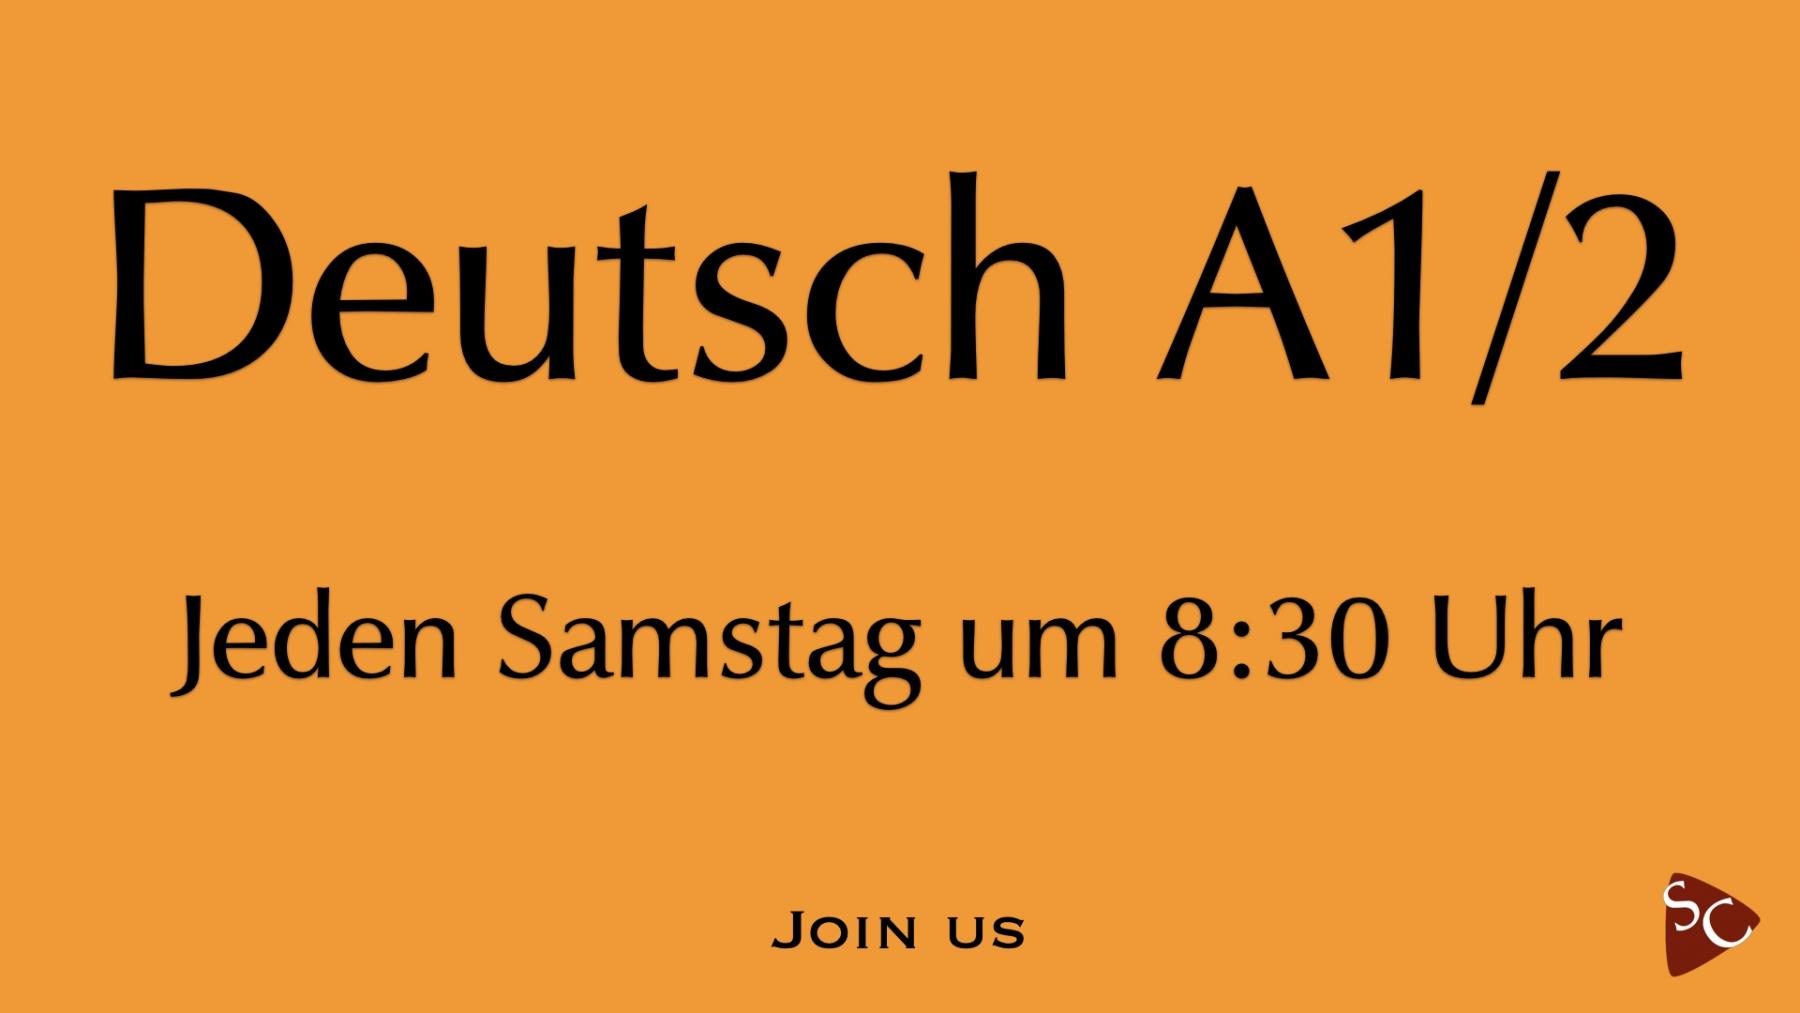 ASCL presentation Stundenplan 20200613.020